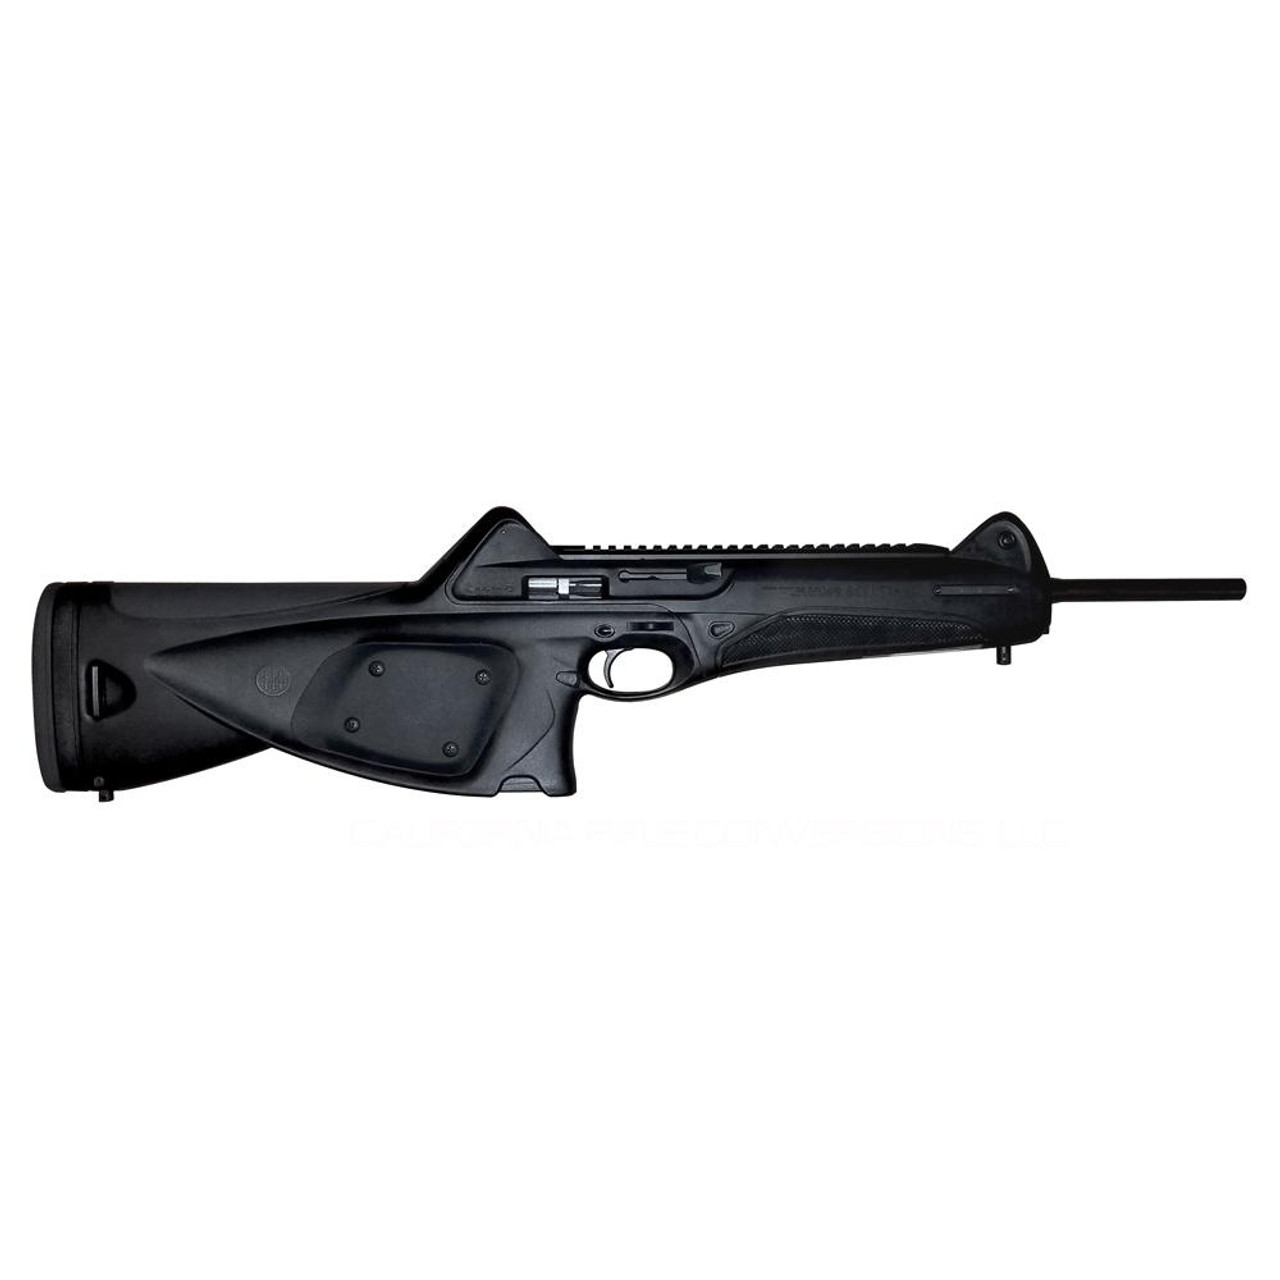 Beretta CX4 Storm CALIFORNIA LEGAL - 9mm